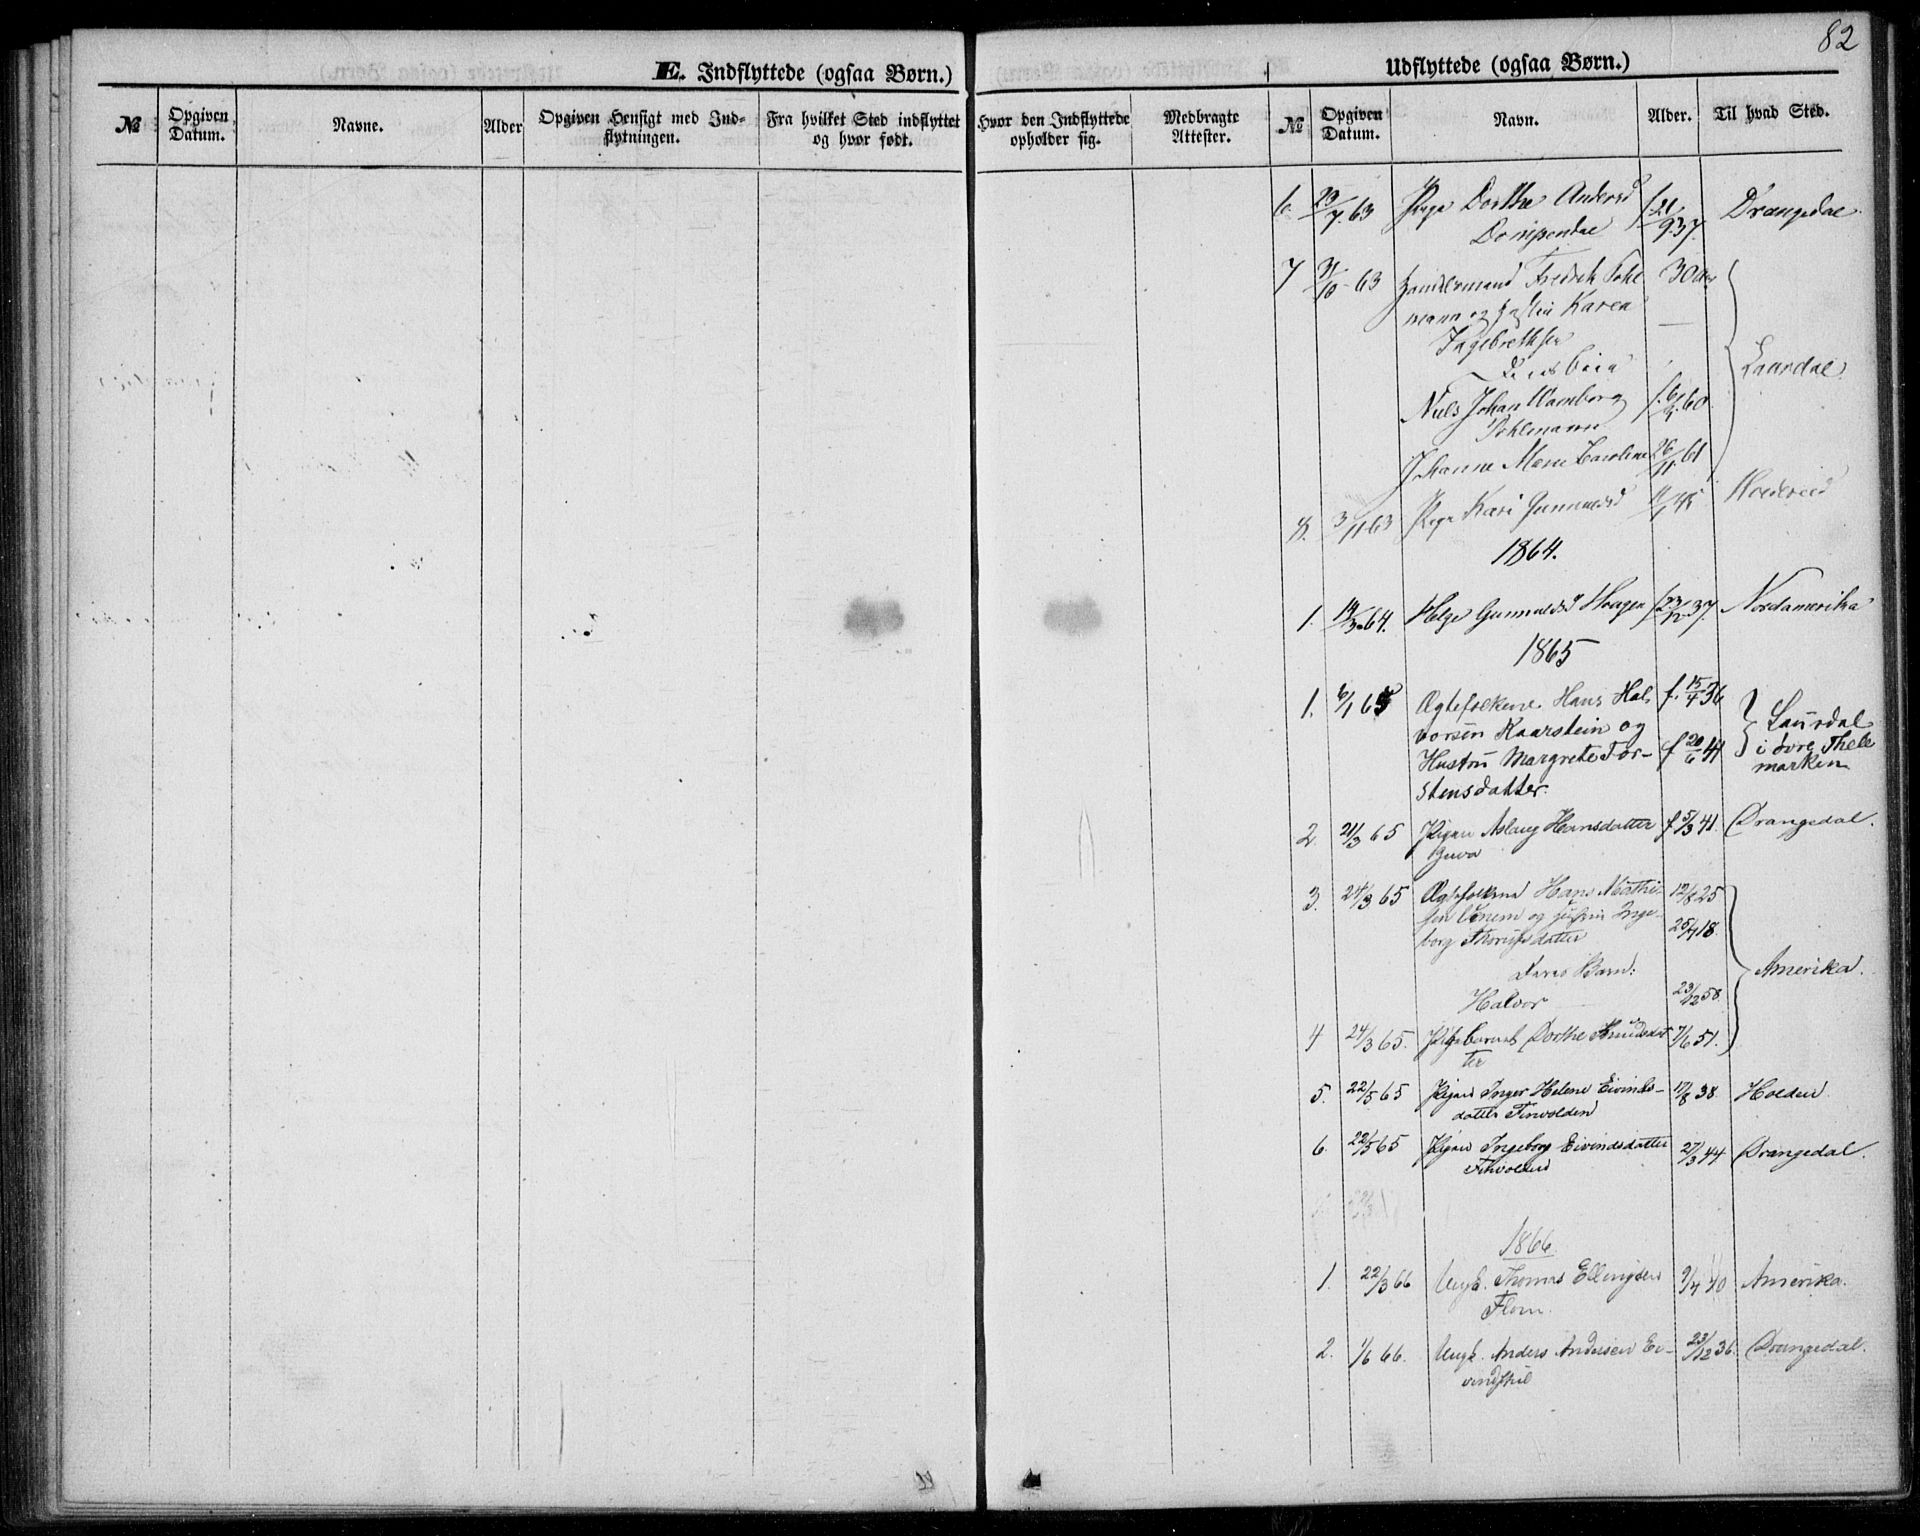 SAKO, Lunde kirkebøker, F/Fb/L0002: Ministerialbok nr. II 2, 1861-1881, s. 82